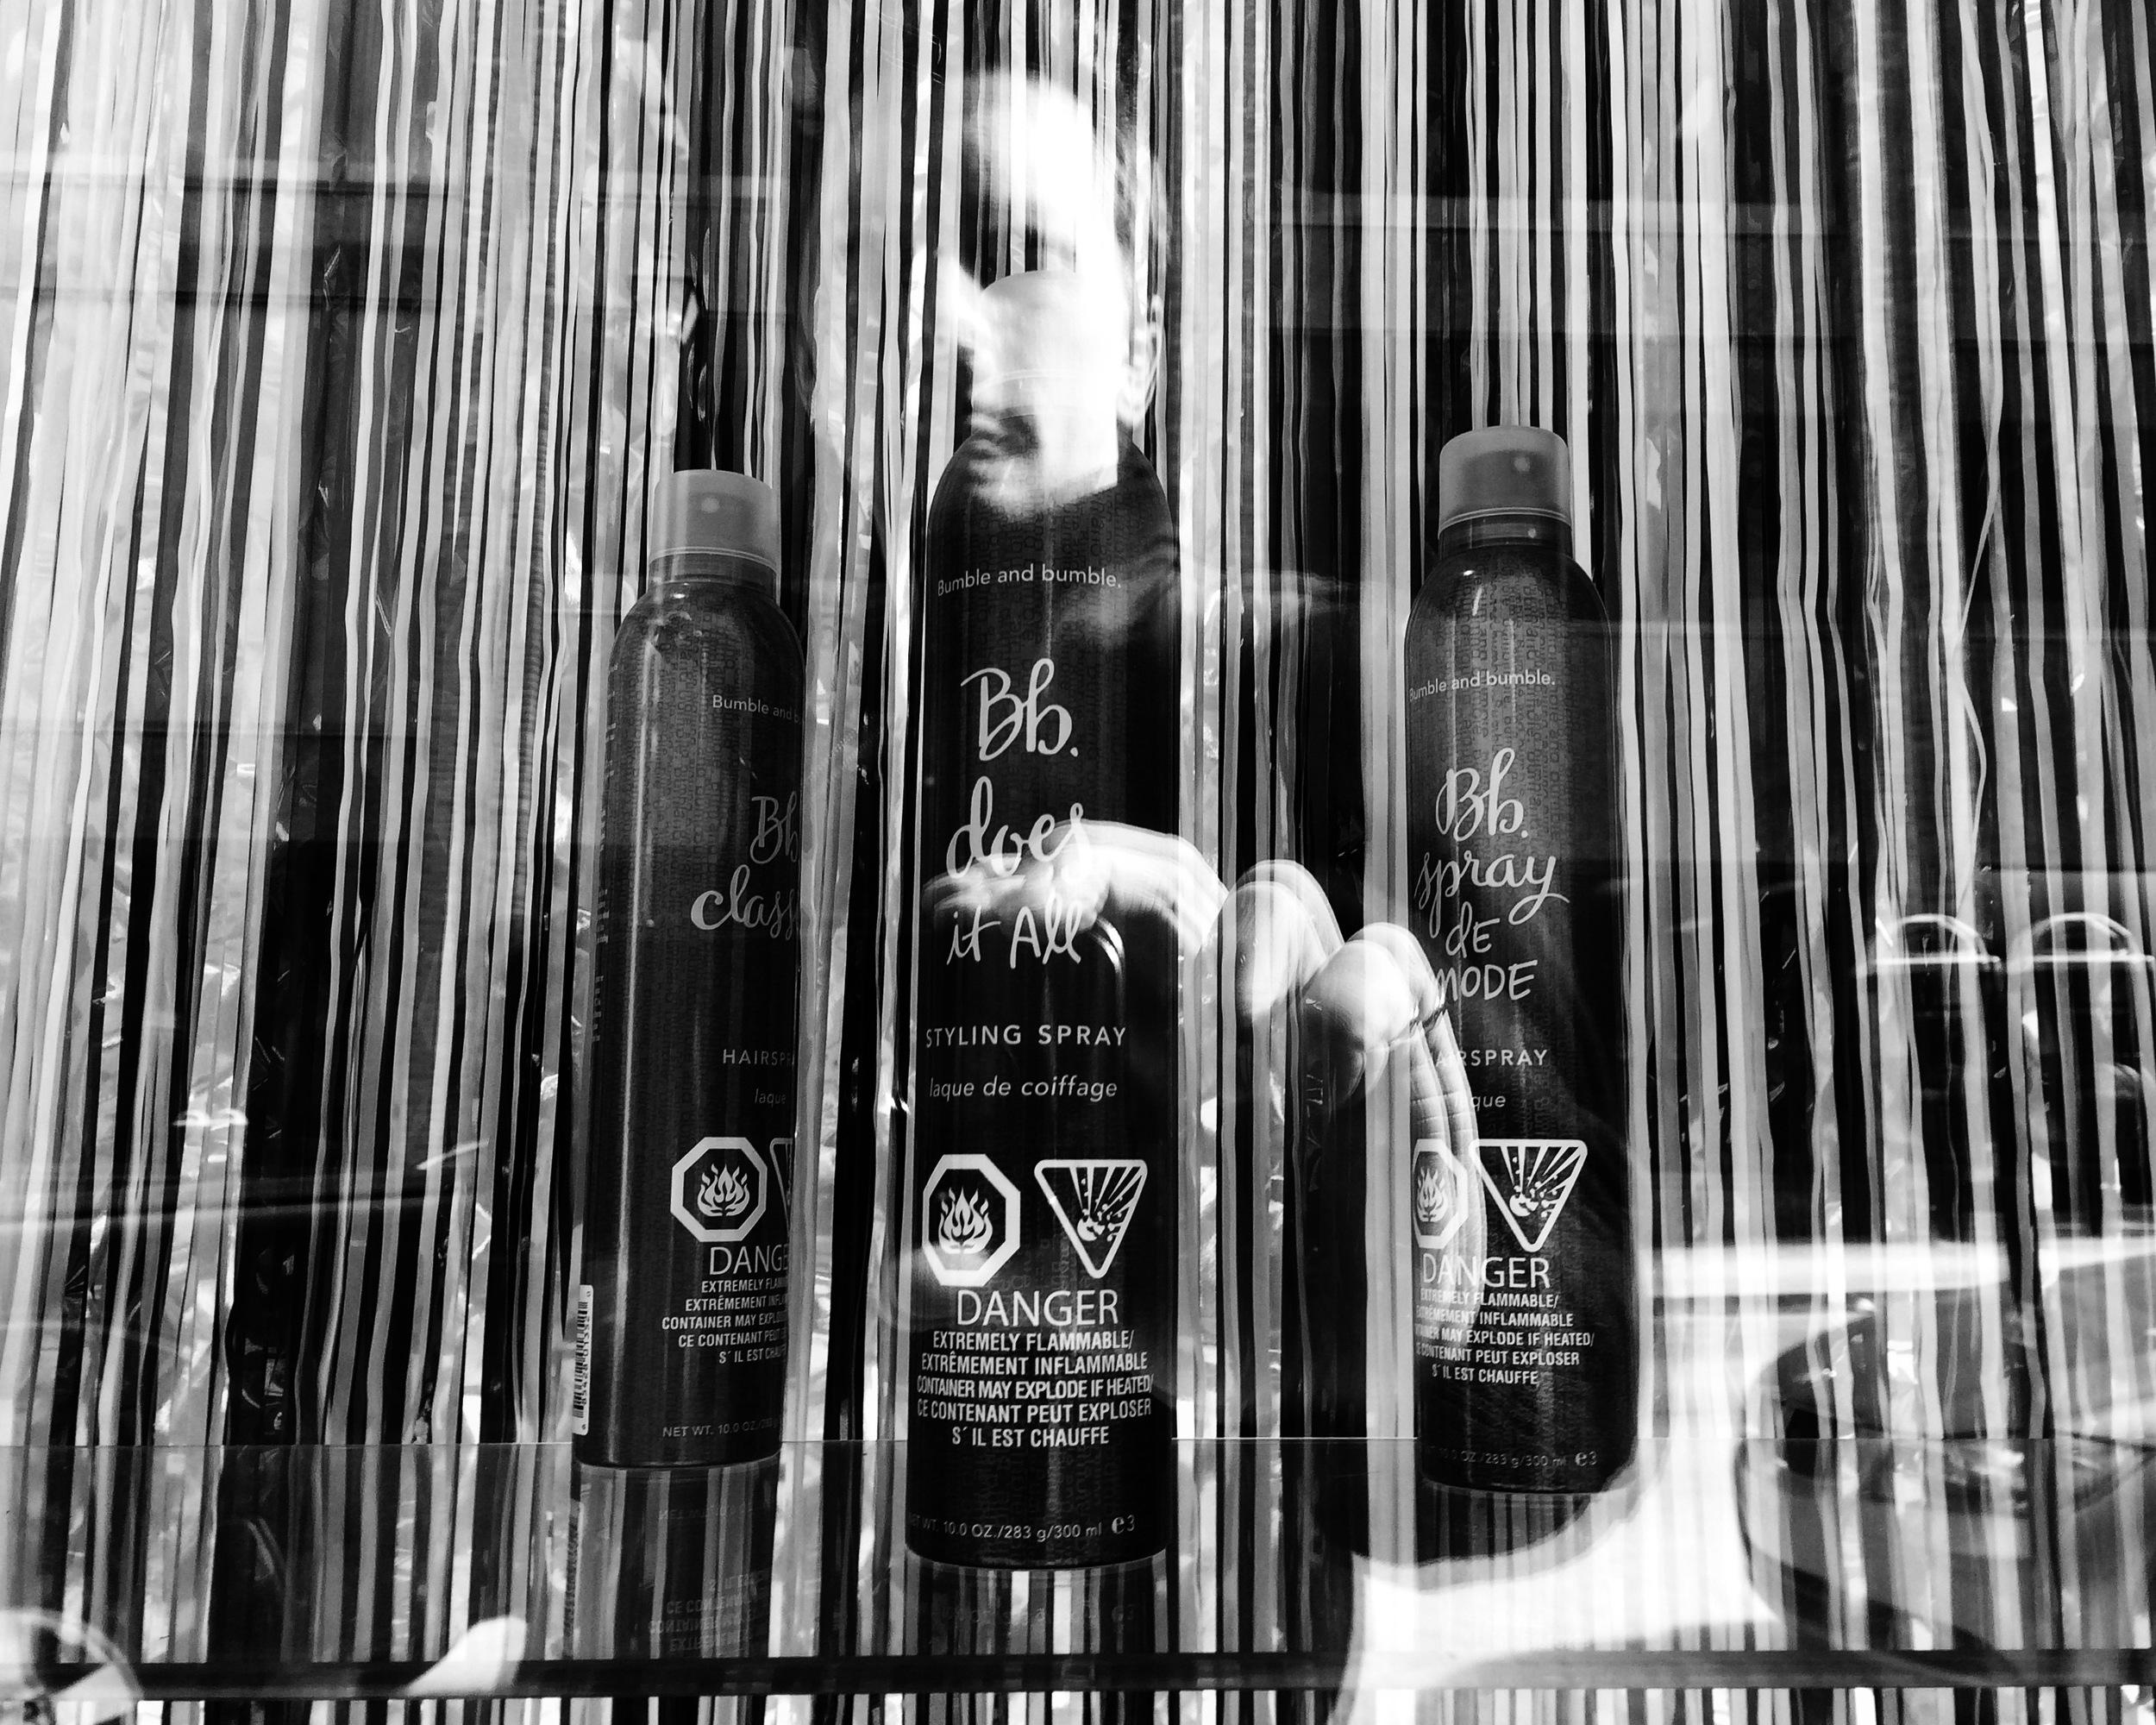 Hair Salon Display Window - Edited with VSCO Cam.